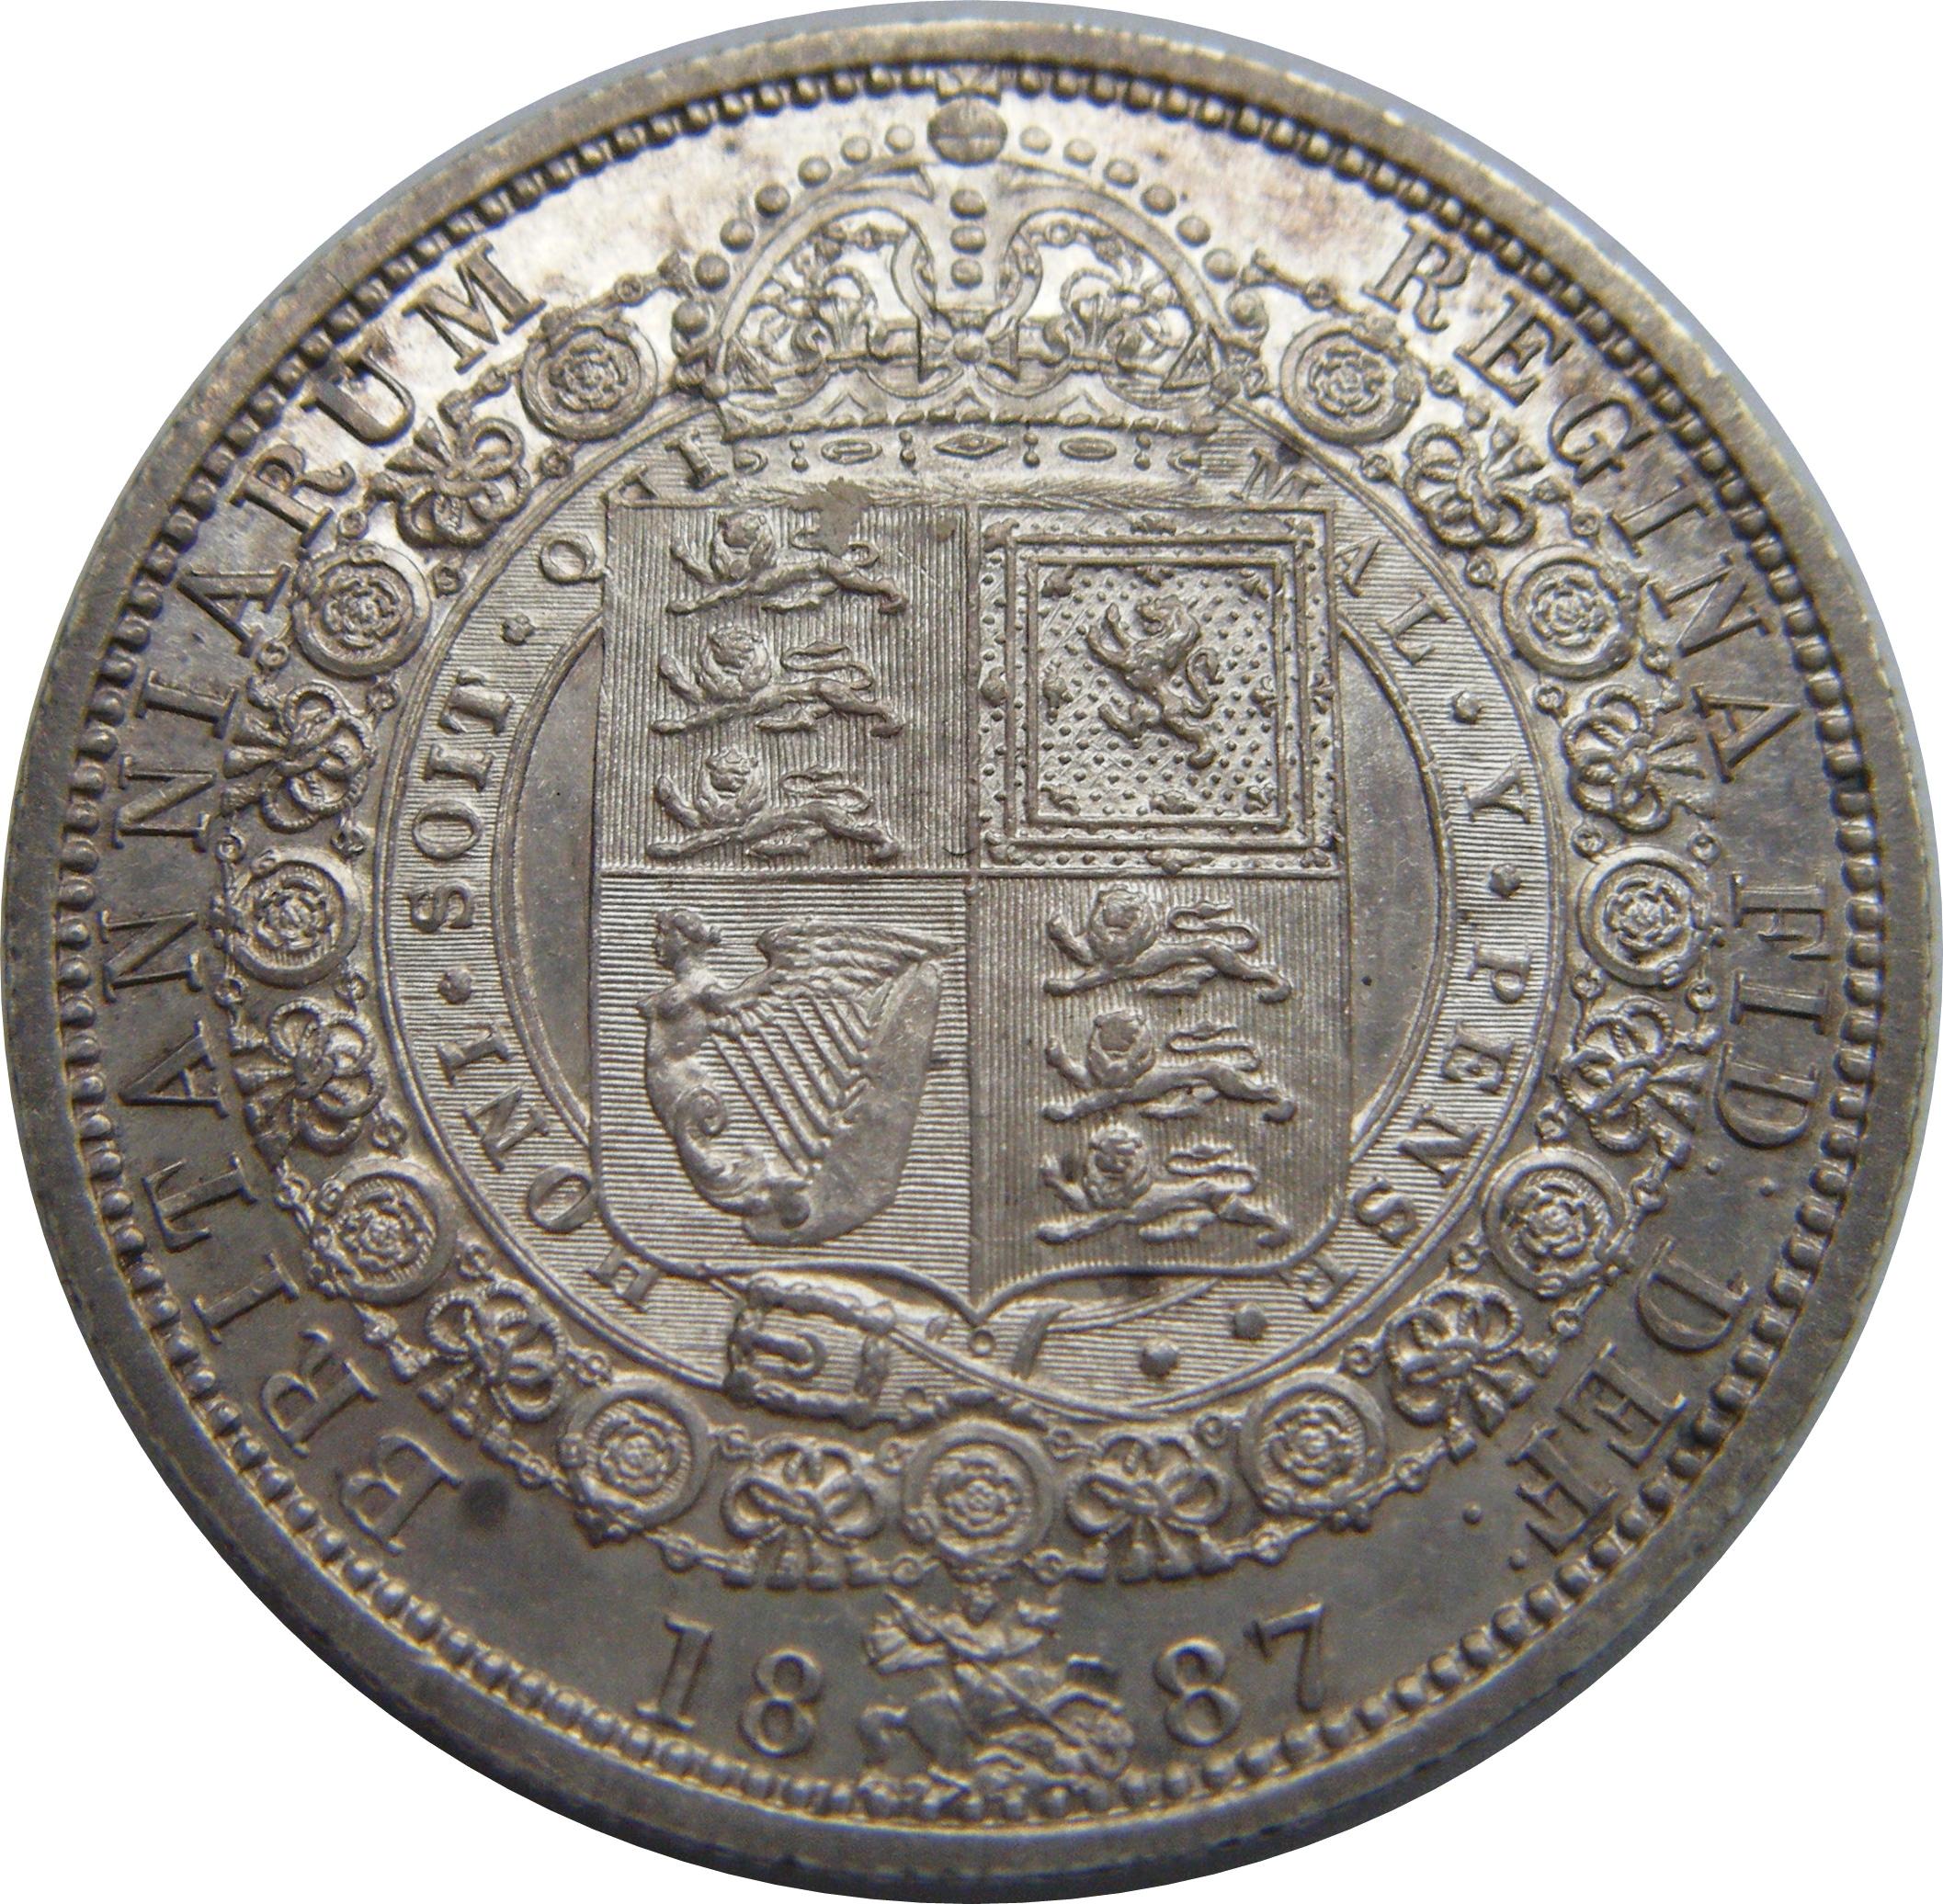 1887 Victoria Half Crown possible proof – Numista